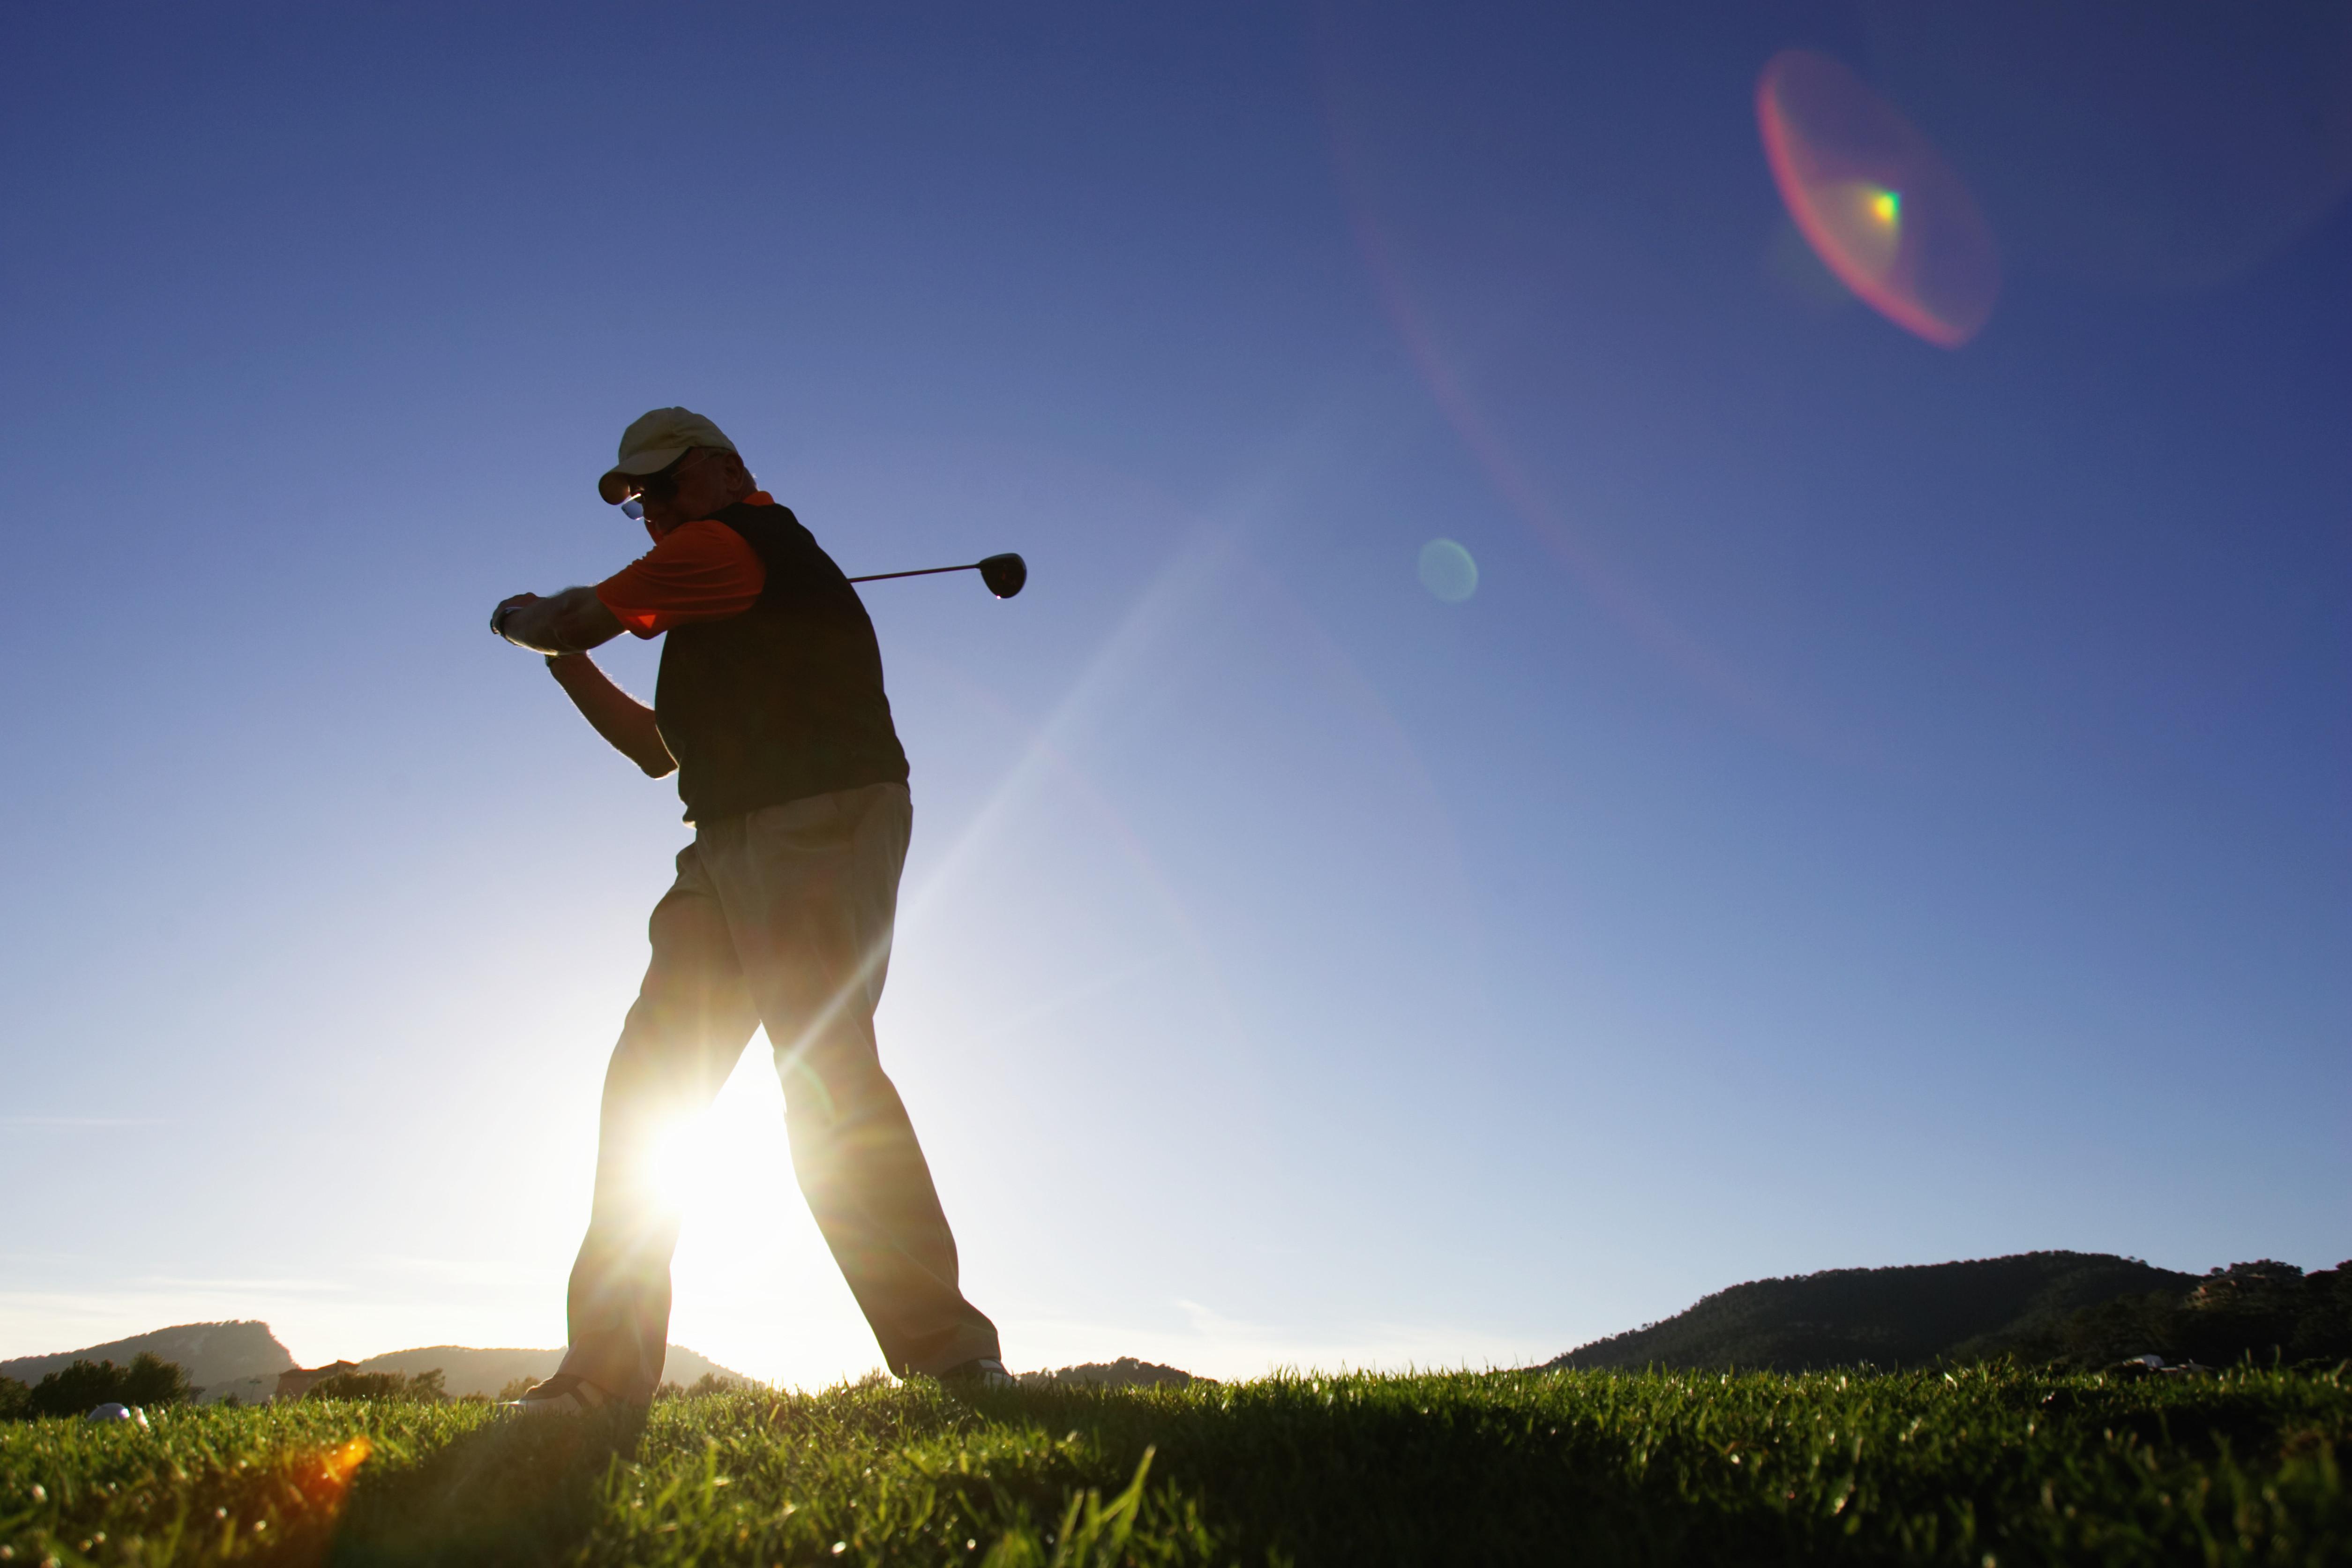 Diamond Resort Invitational At Golden Bear Golf Club